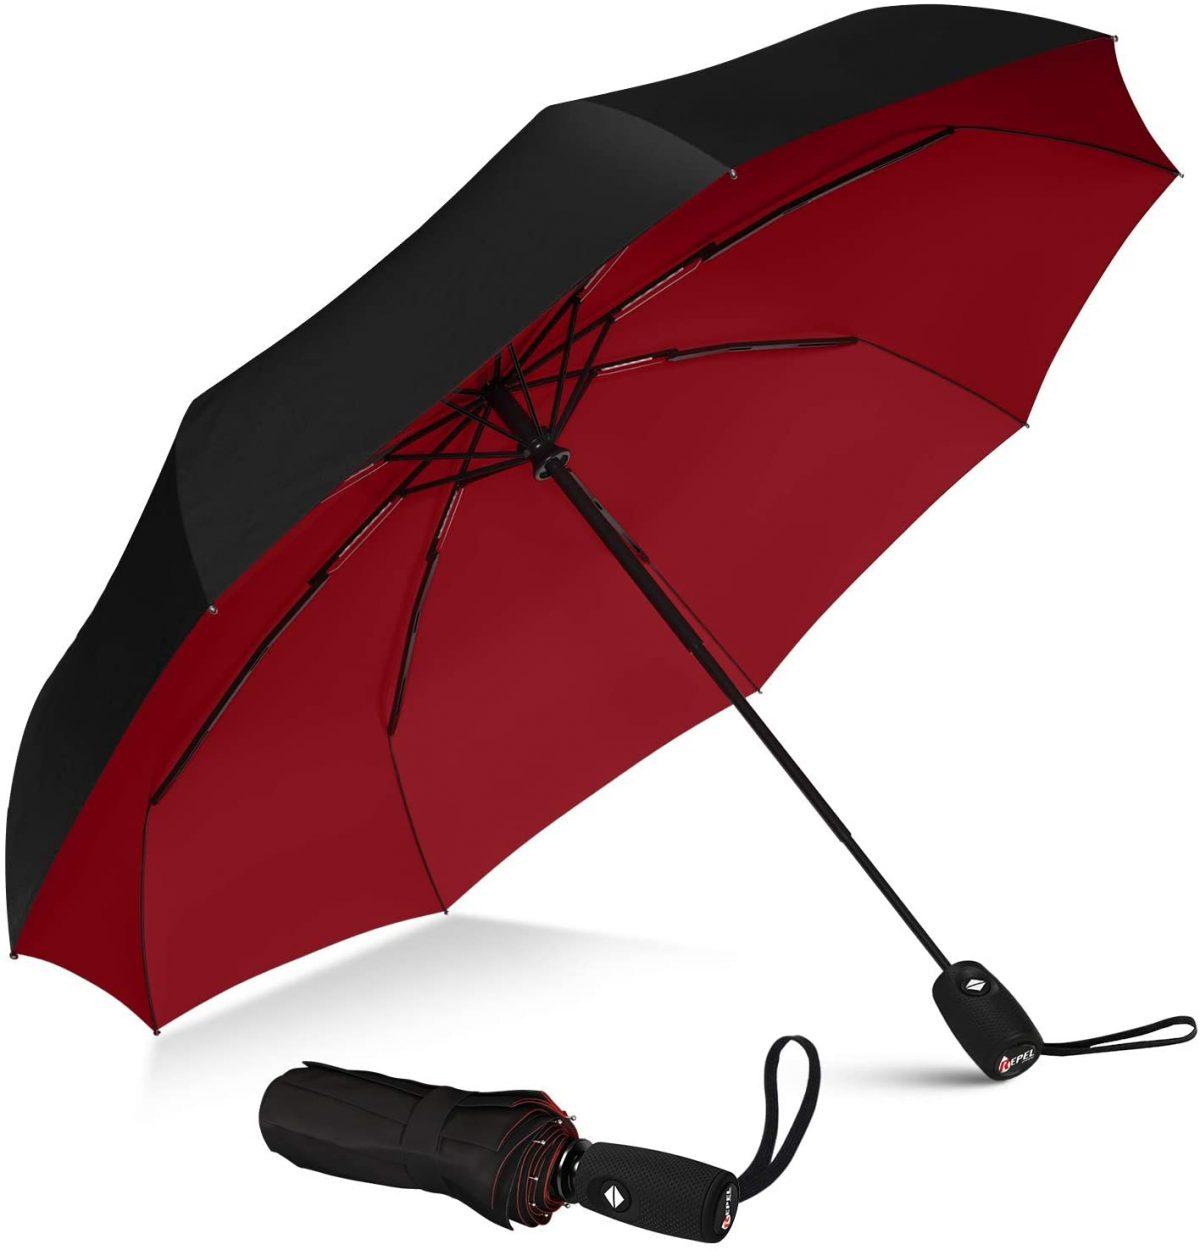 Strong windproof 3 fold umbrella